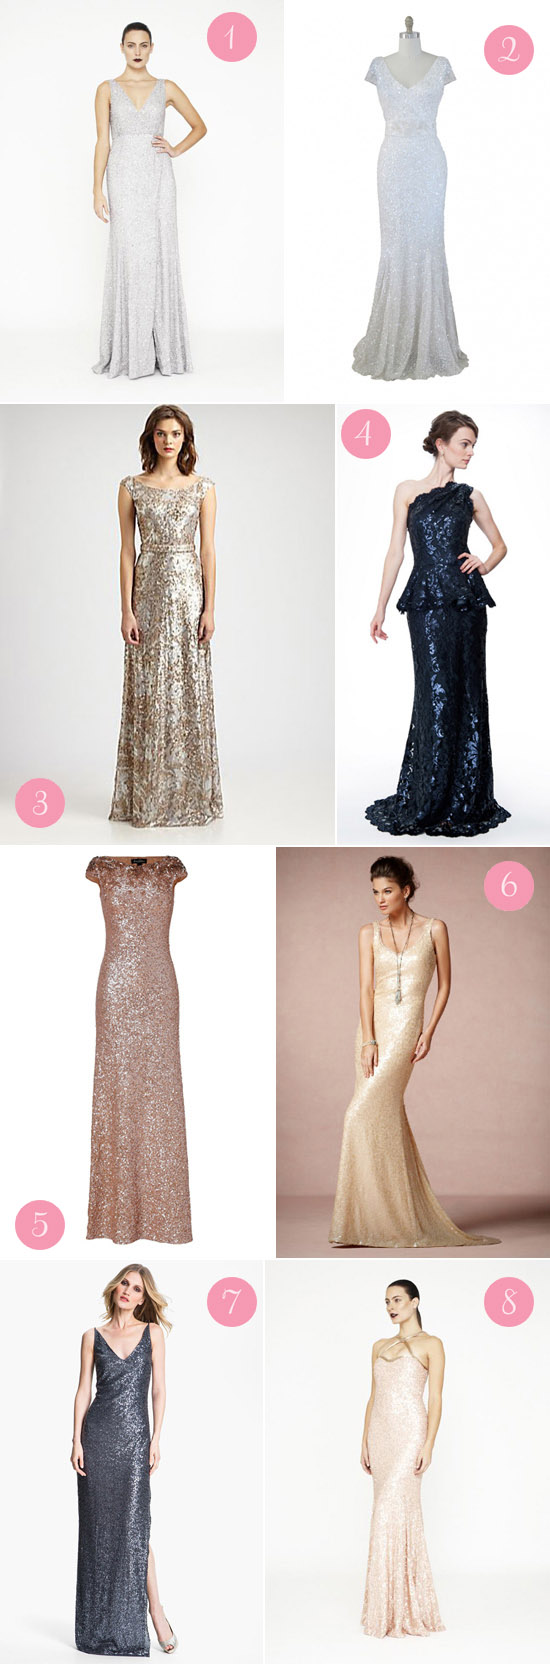 sequin wedding gowns